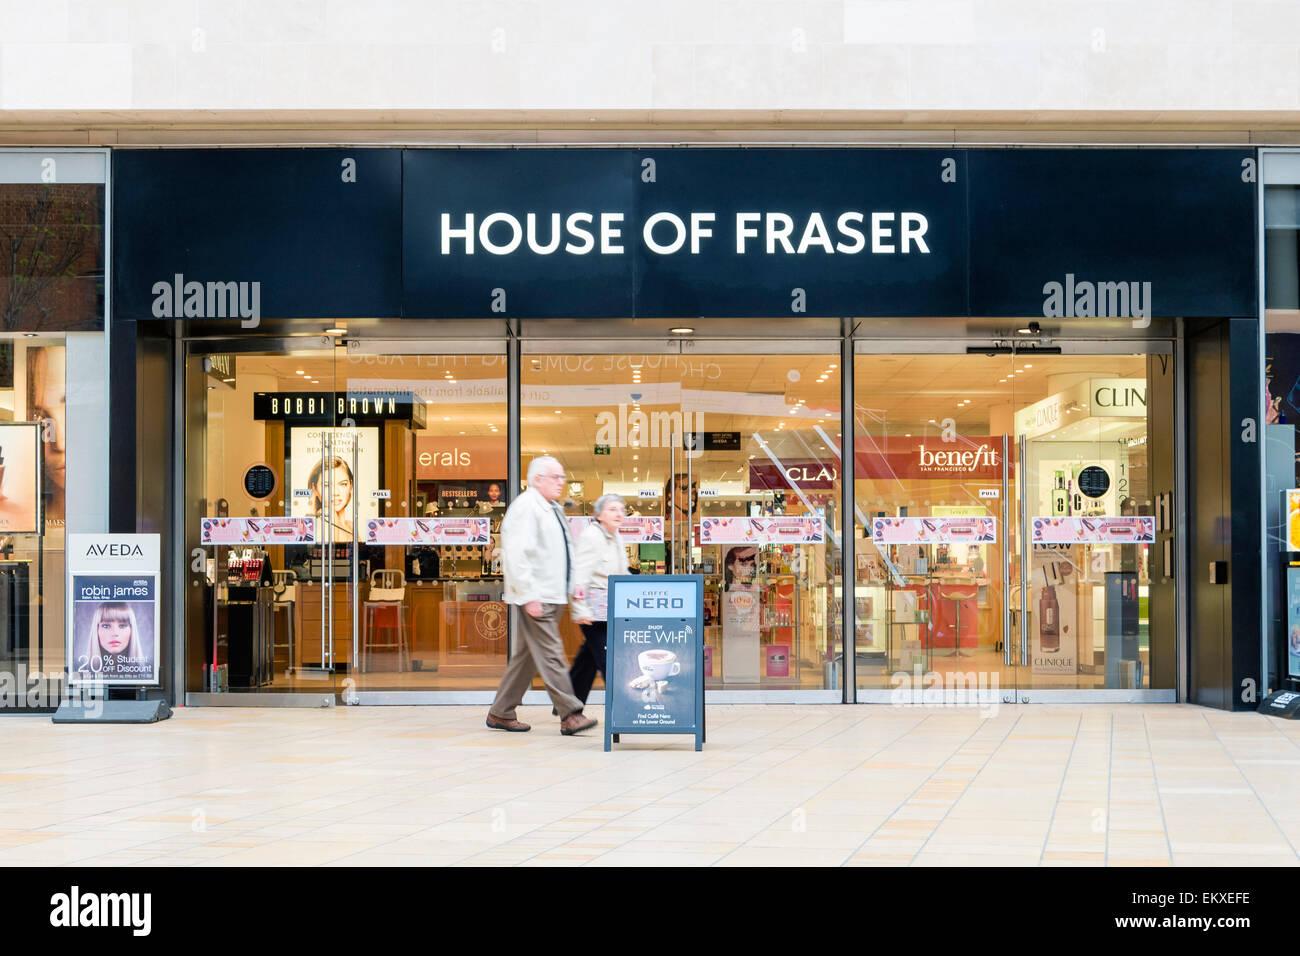 House of Fraser store, Bristol, UK. - Stock Image